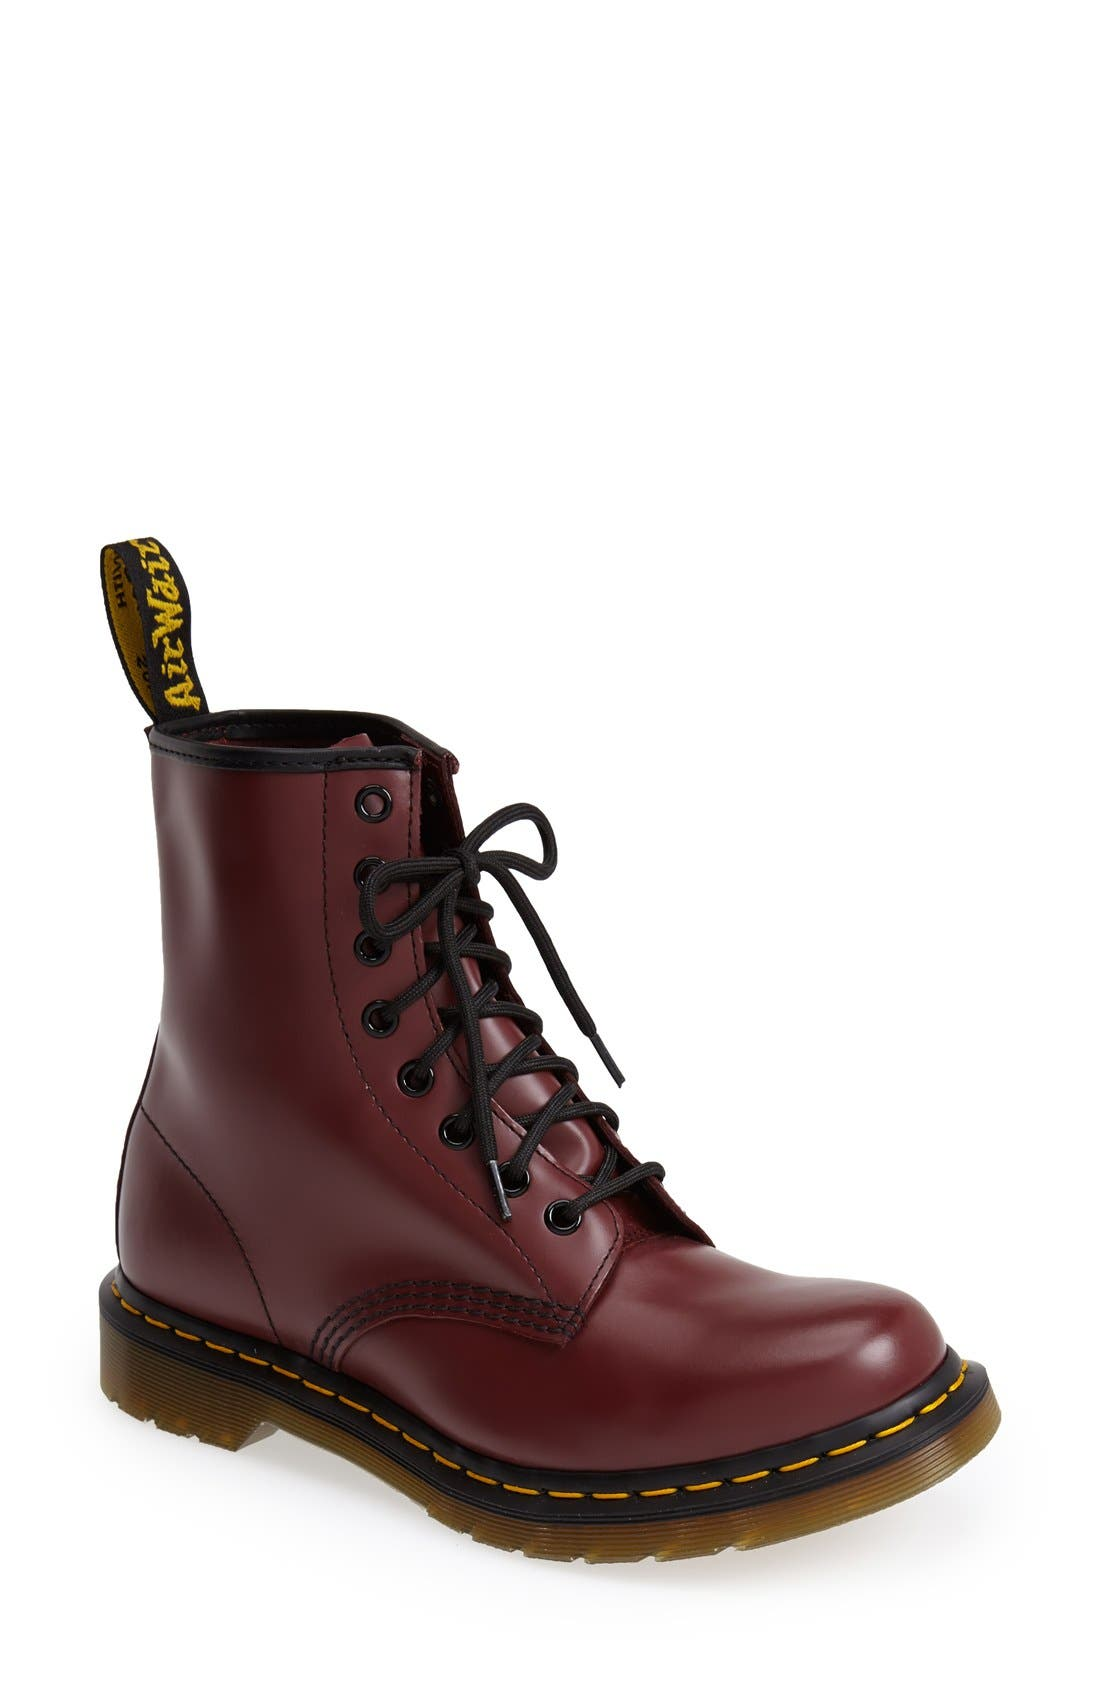 '1460 W' Boot,                             Main thumbnail 1, color,                             600